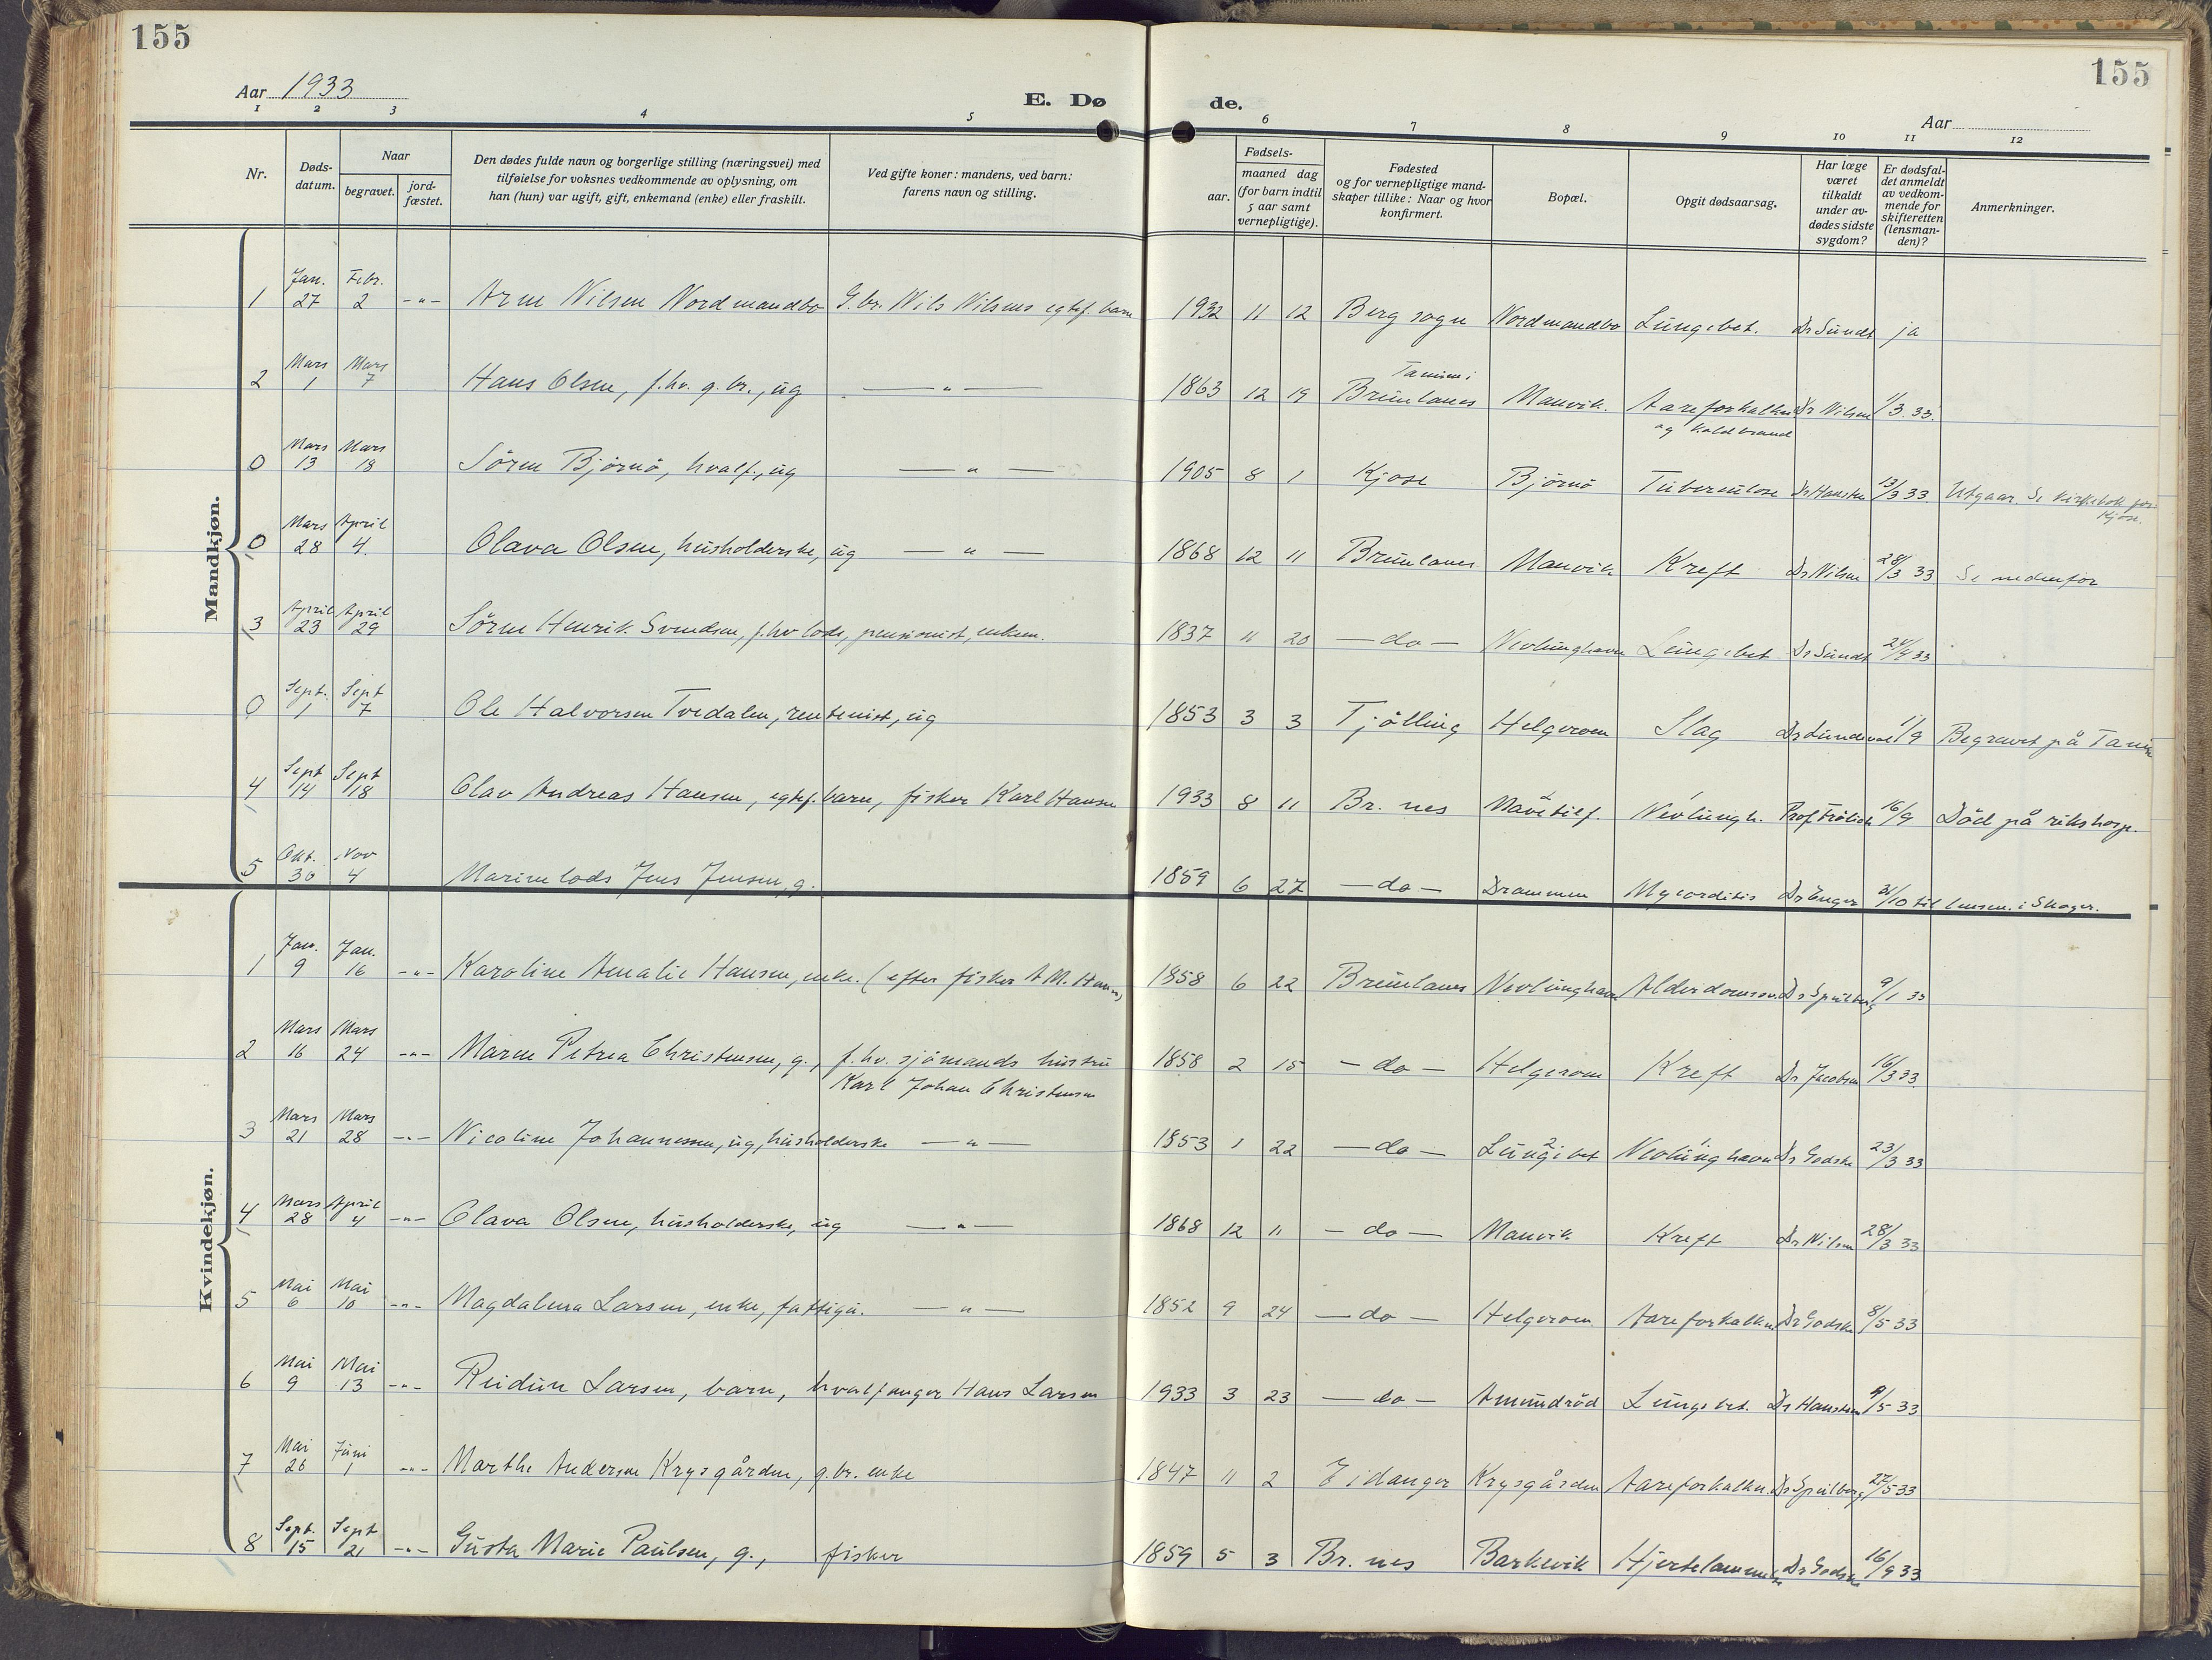 SAKO, Brunlanes kirkebøker, F/Fb/L0004: Ministerialbok nr. II 4, 1923-1940, s. 155